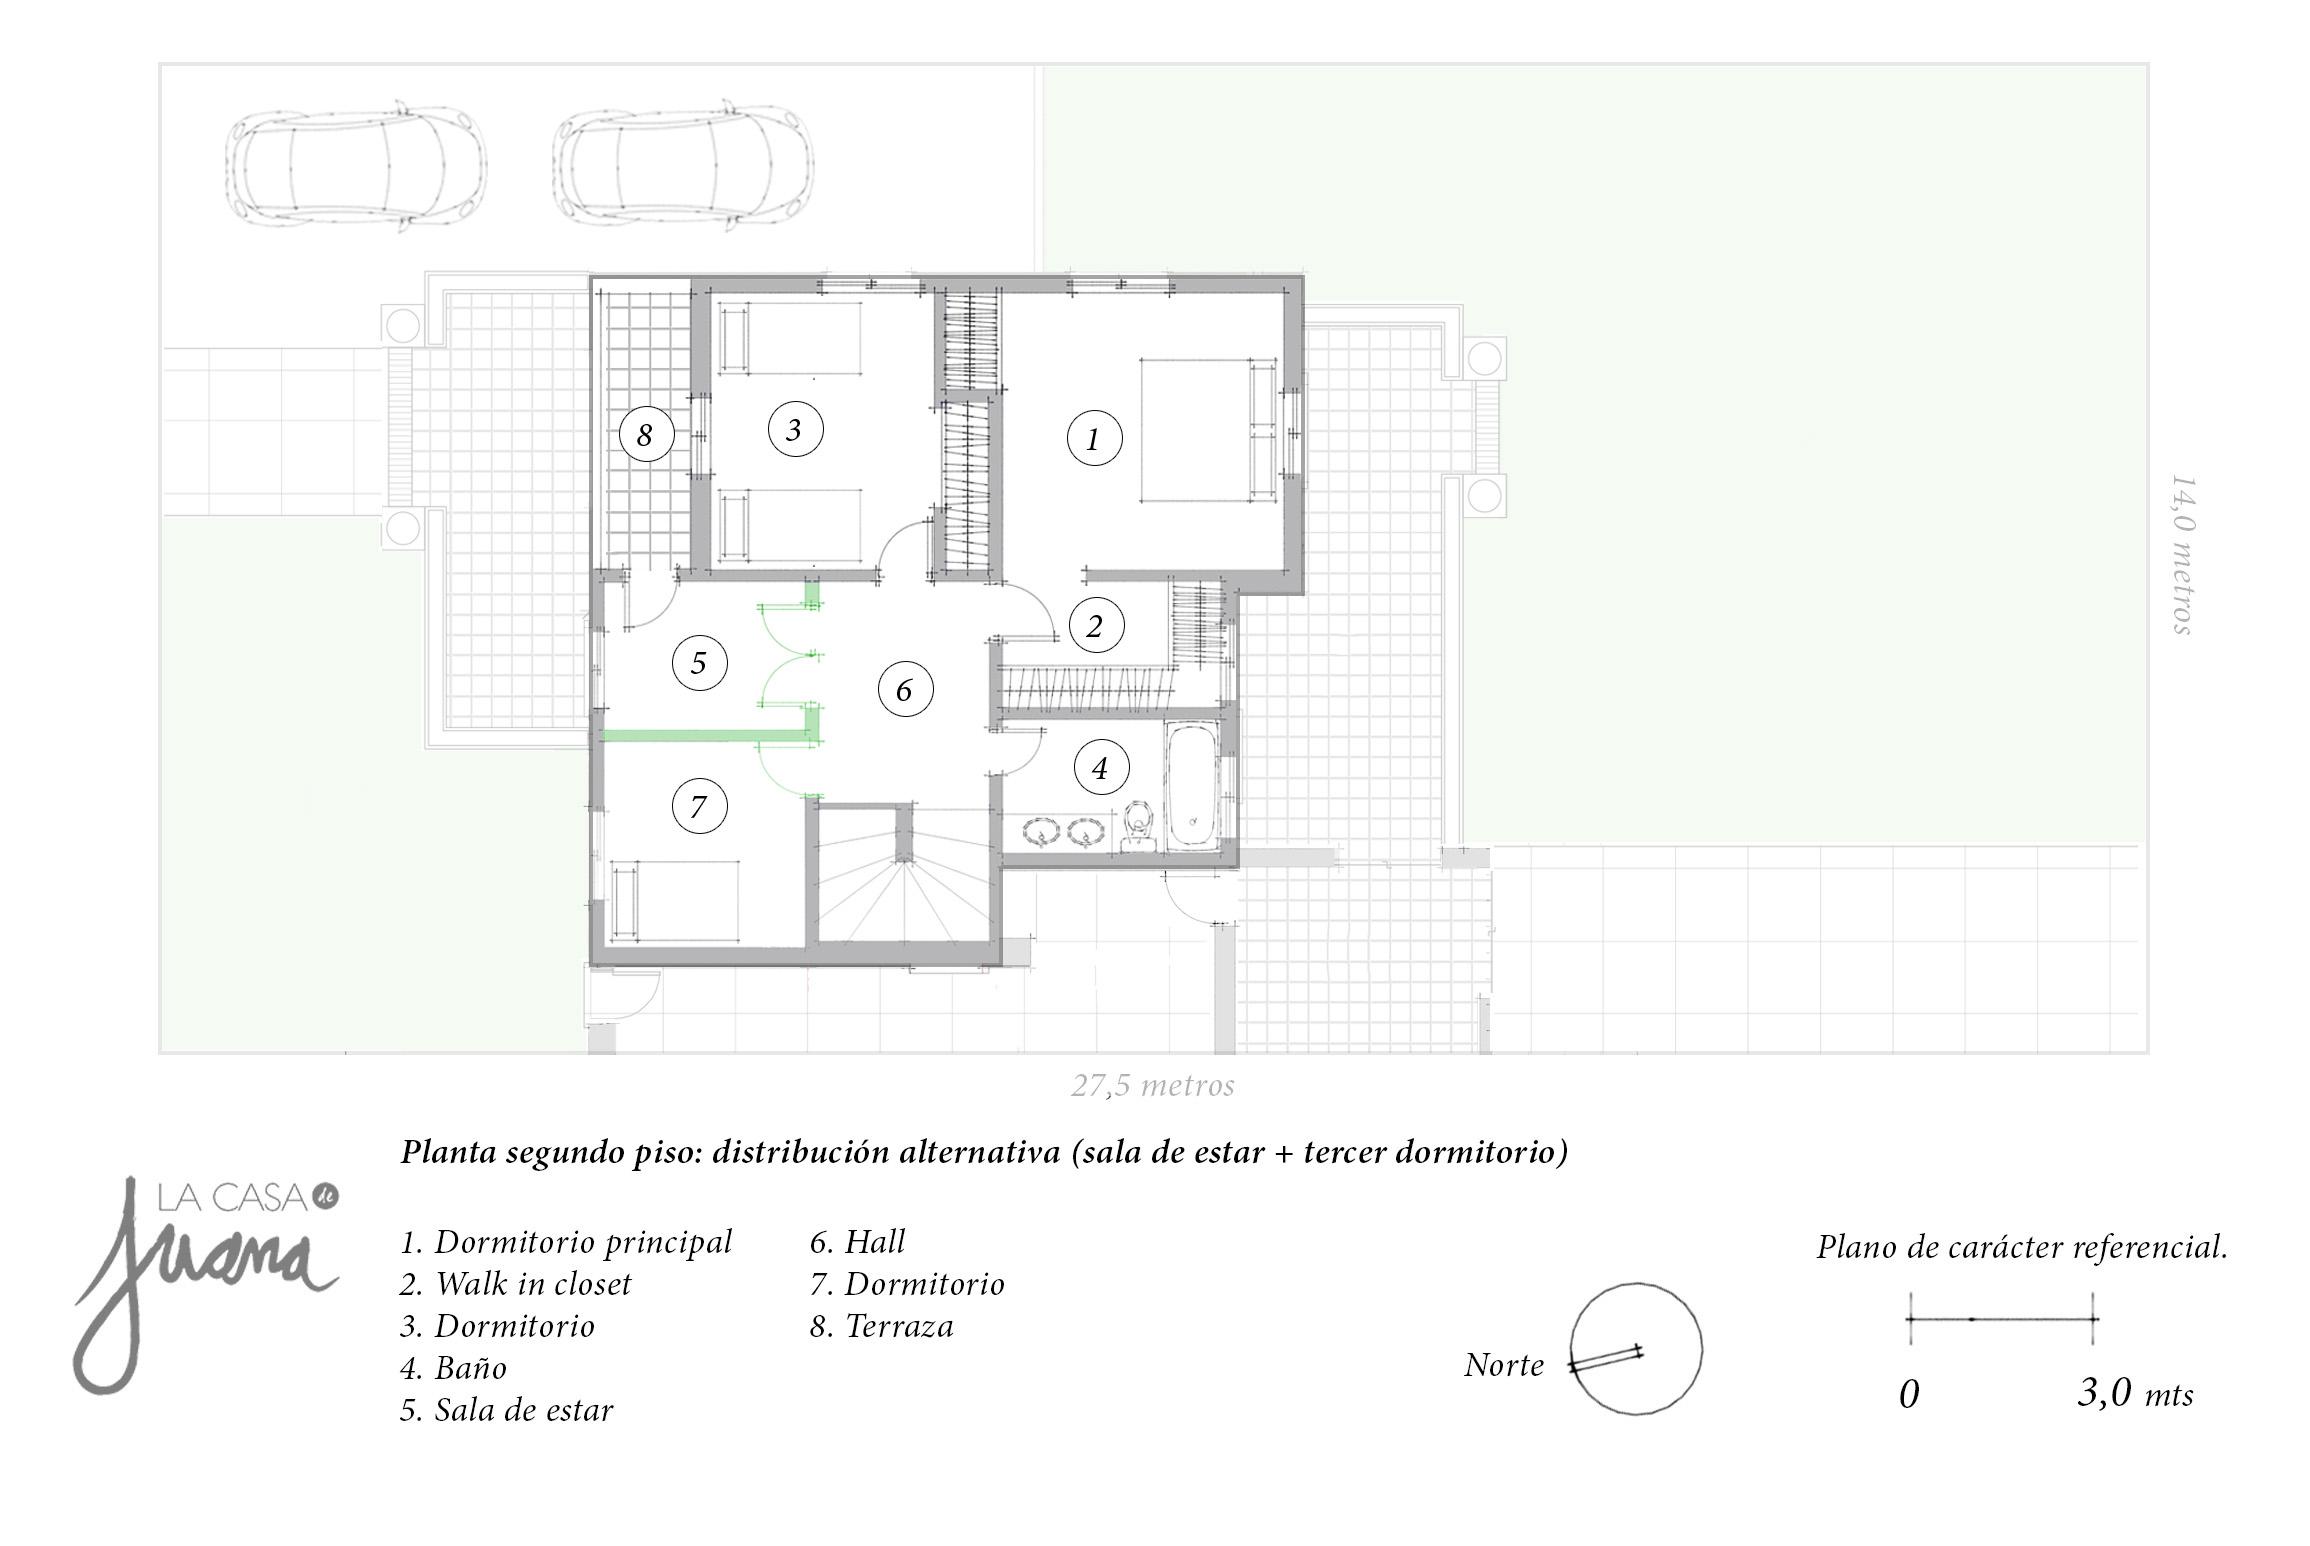 Segundo piso_alternativa